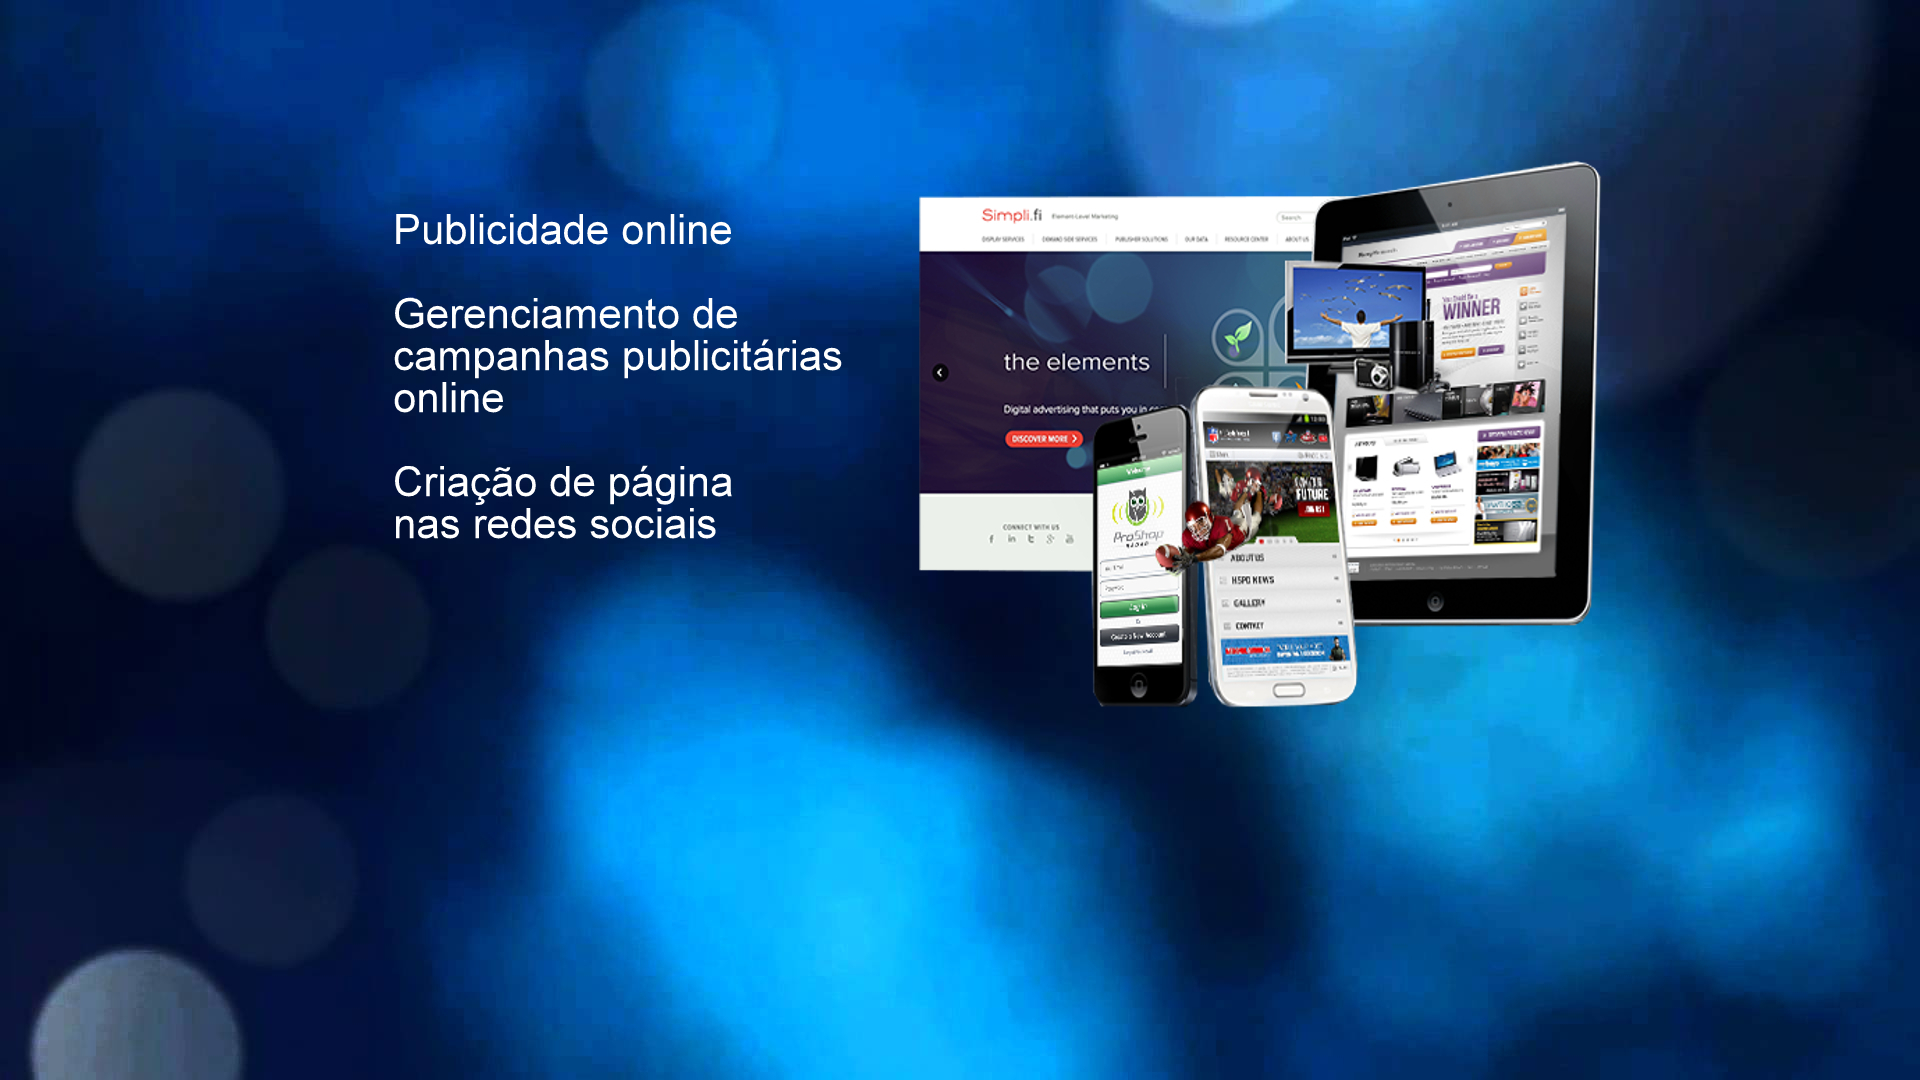 publicidade on line